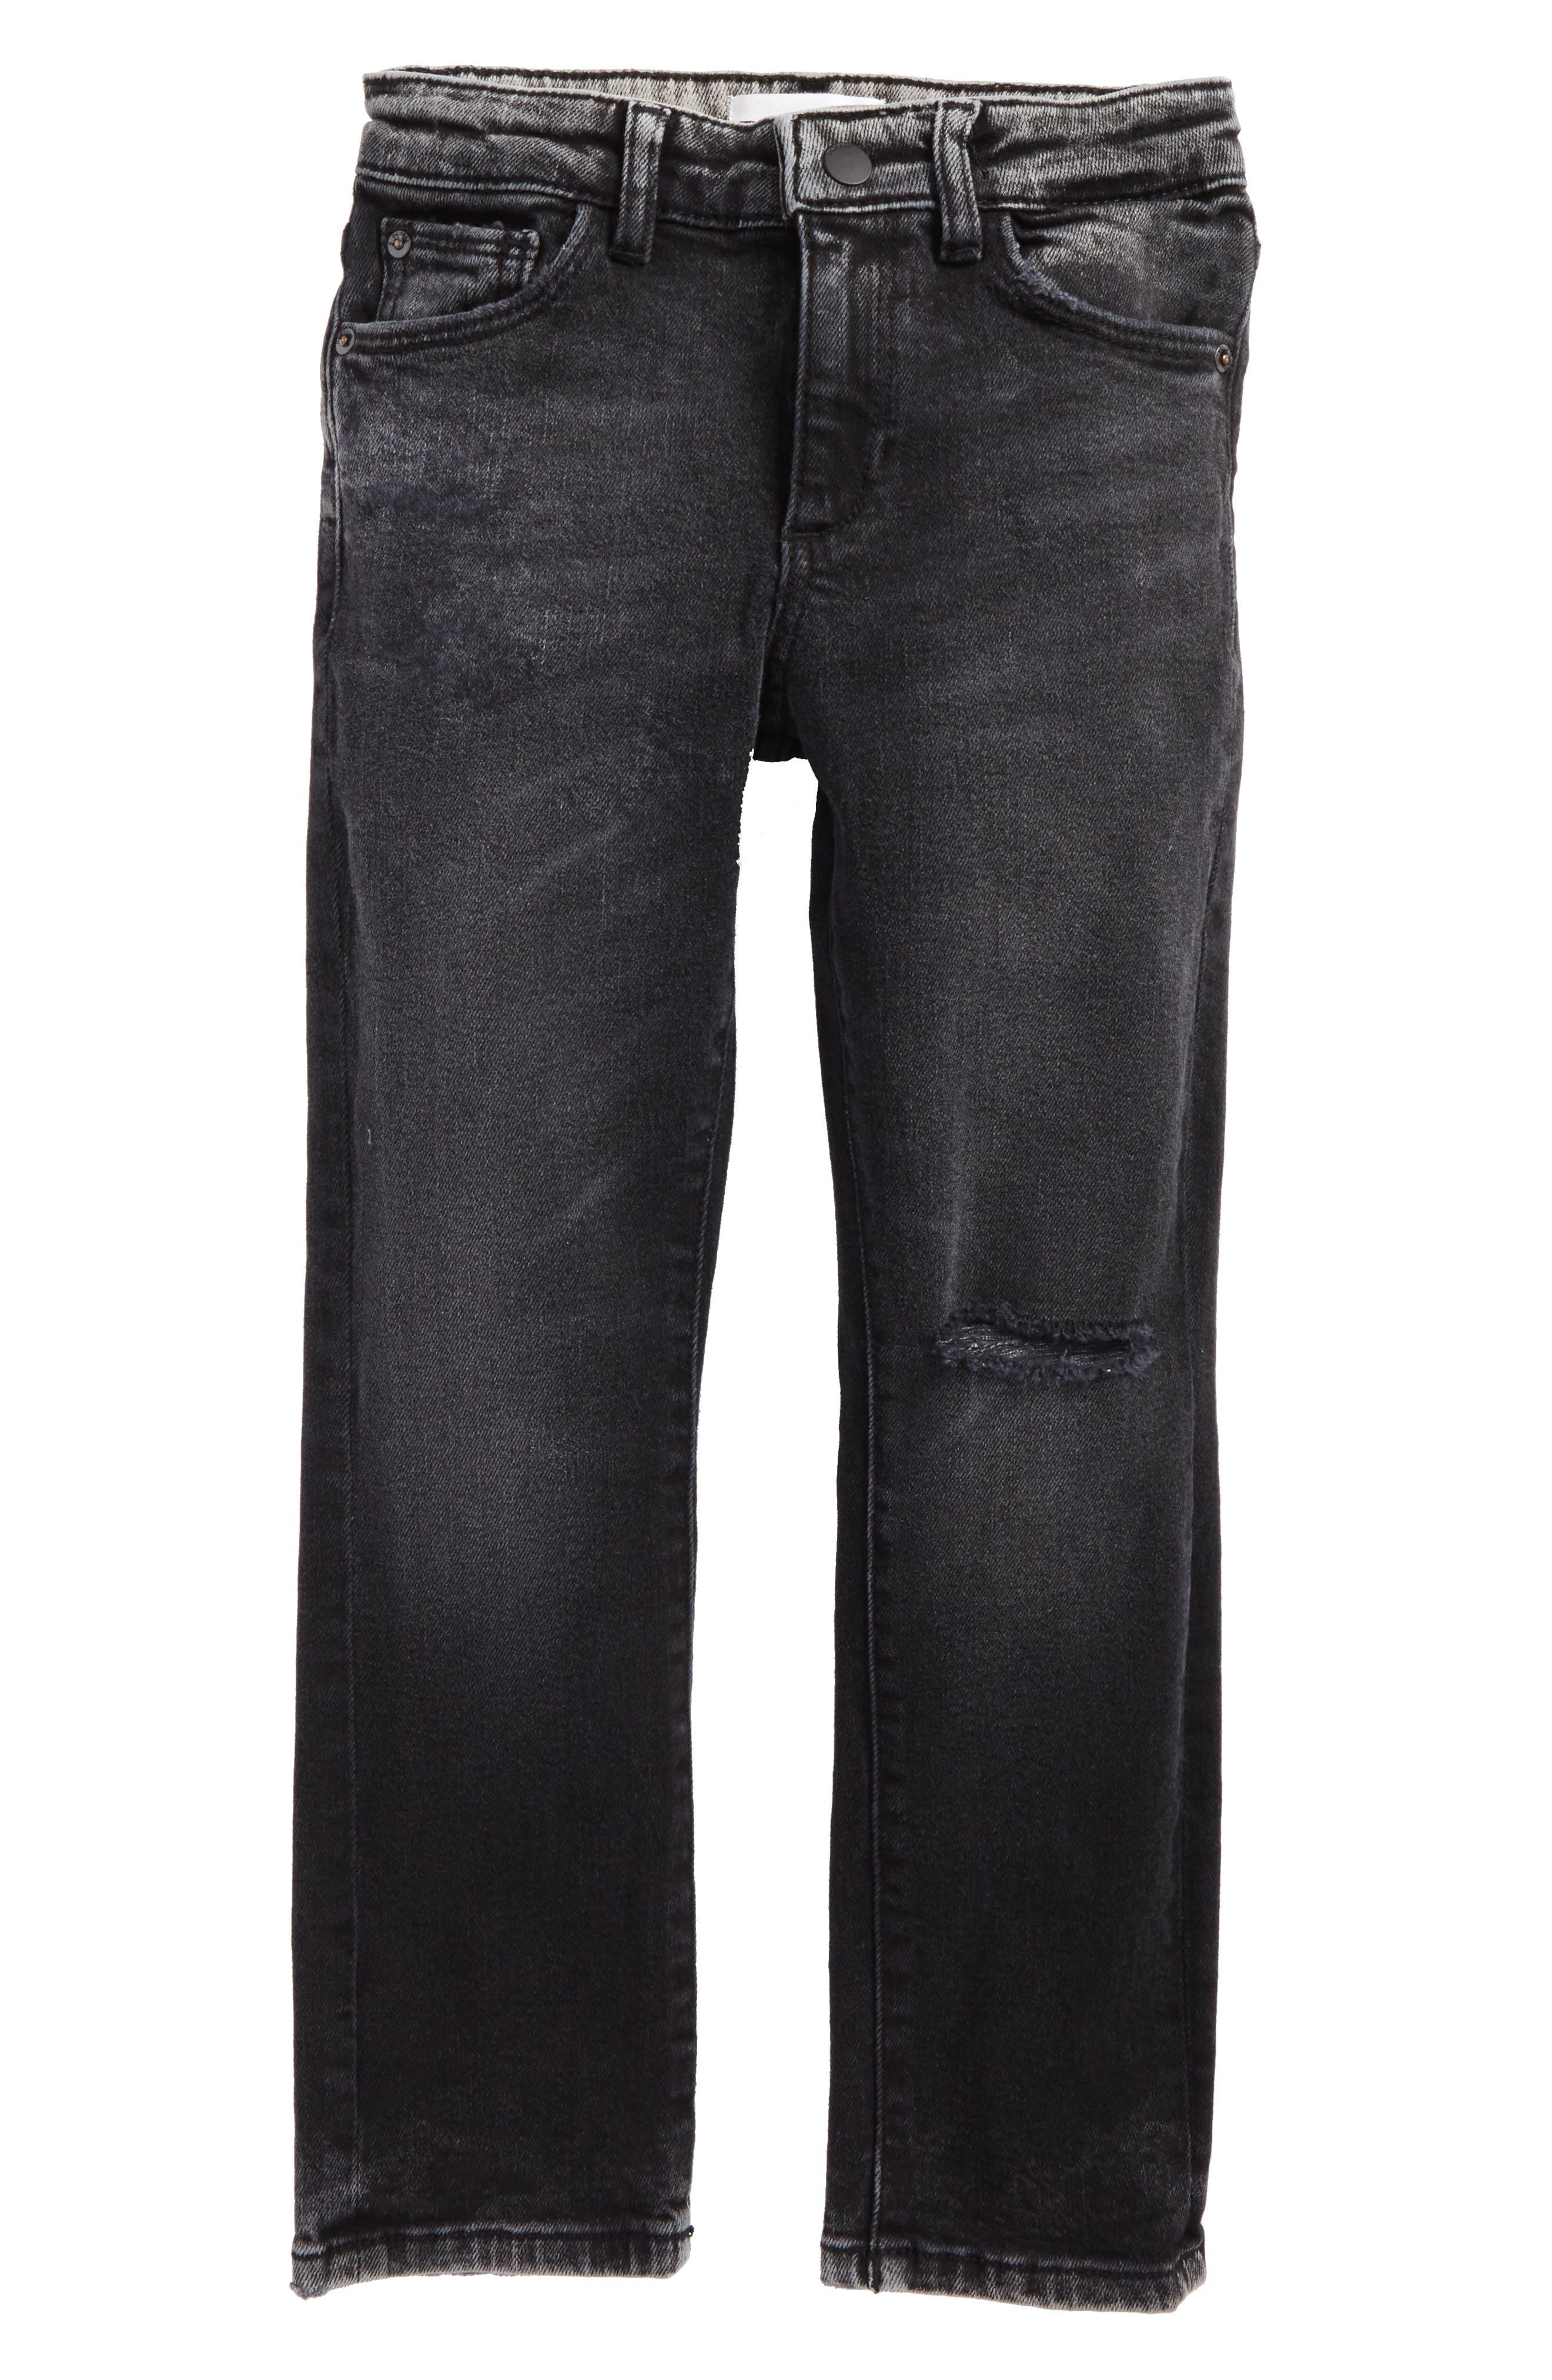 Main Image - DL1961 Hawke Skinny Jeans (Toddler Boys & Little Boys)